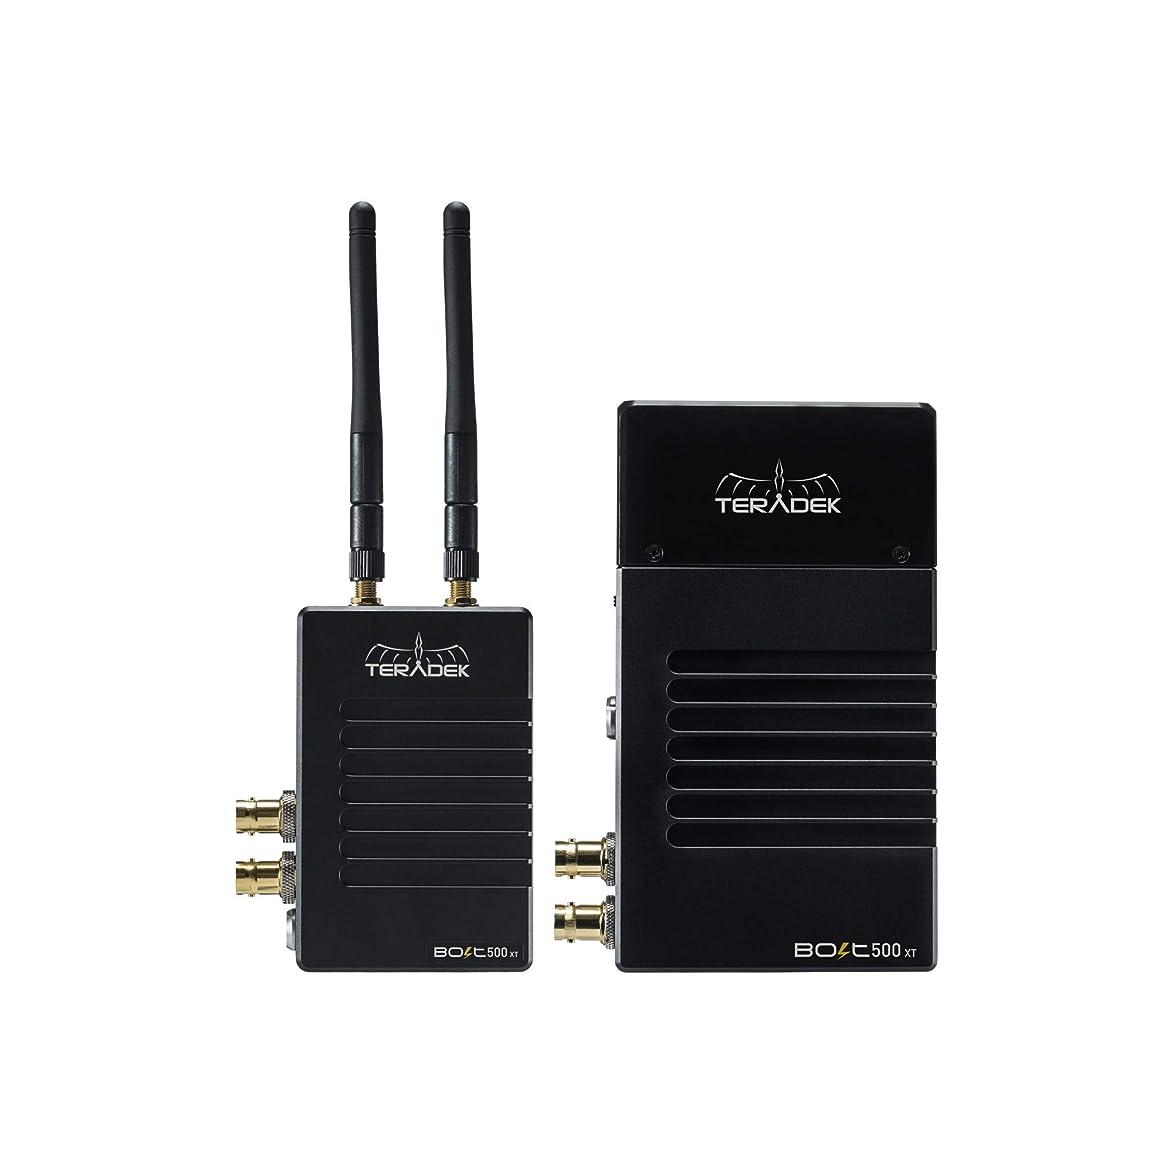 Bolt 500 XT 3G-SDI/HDMI Wireless TX/RX